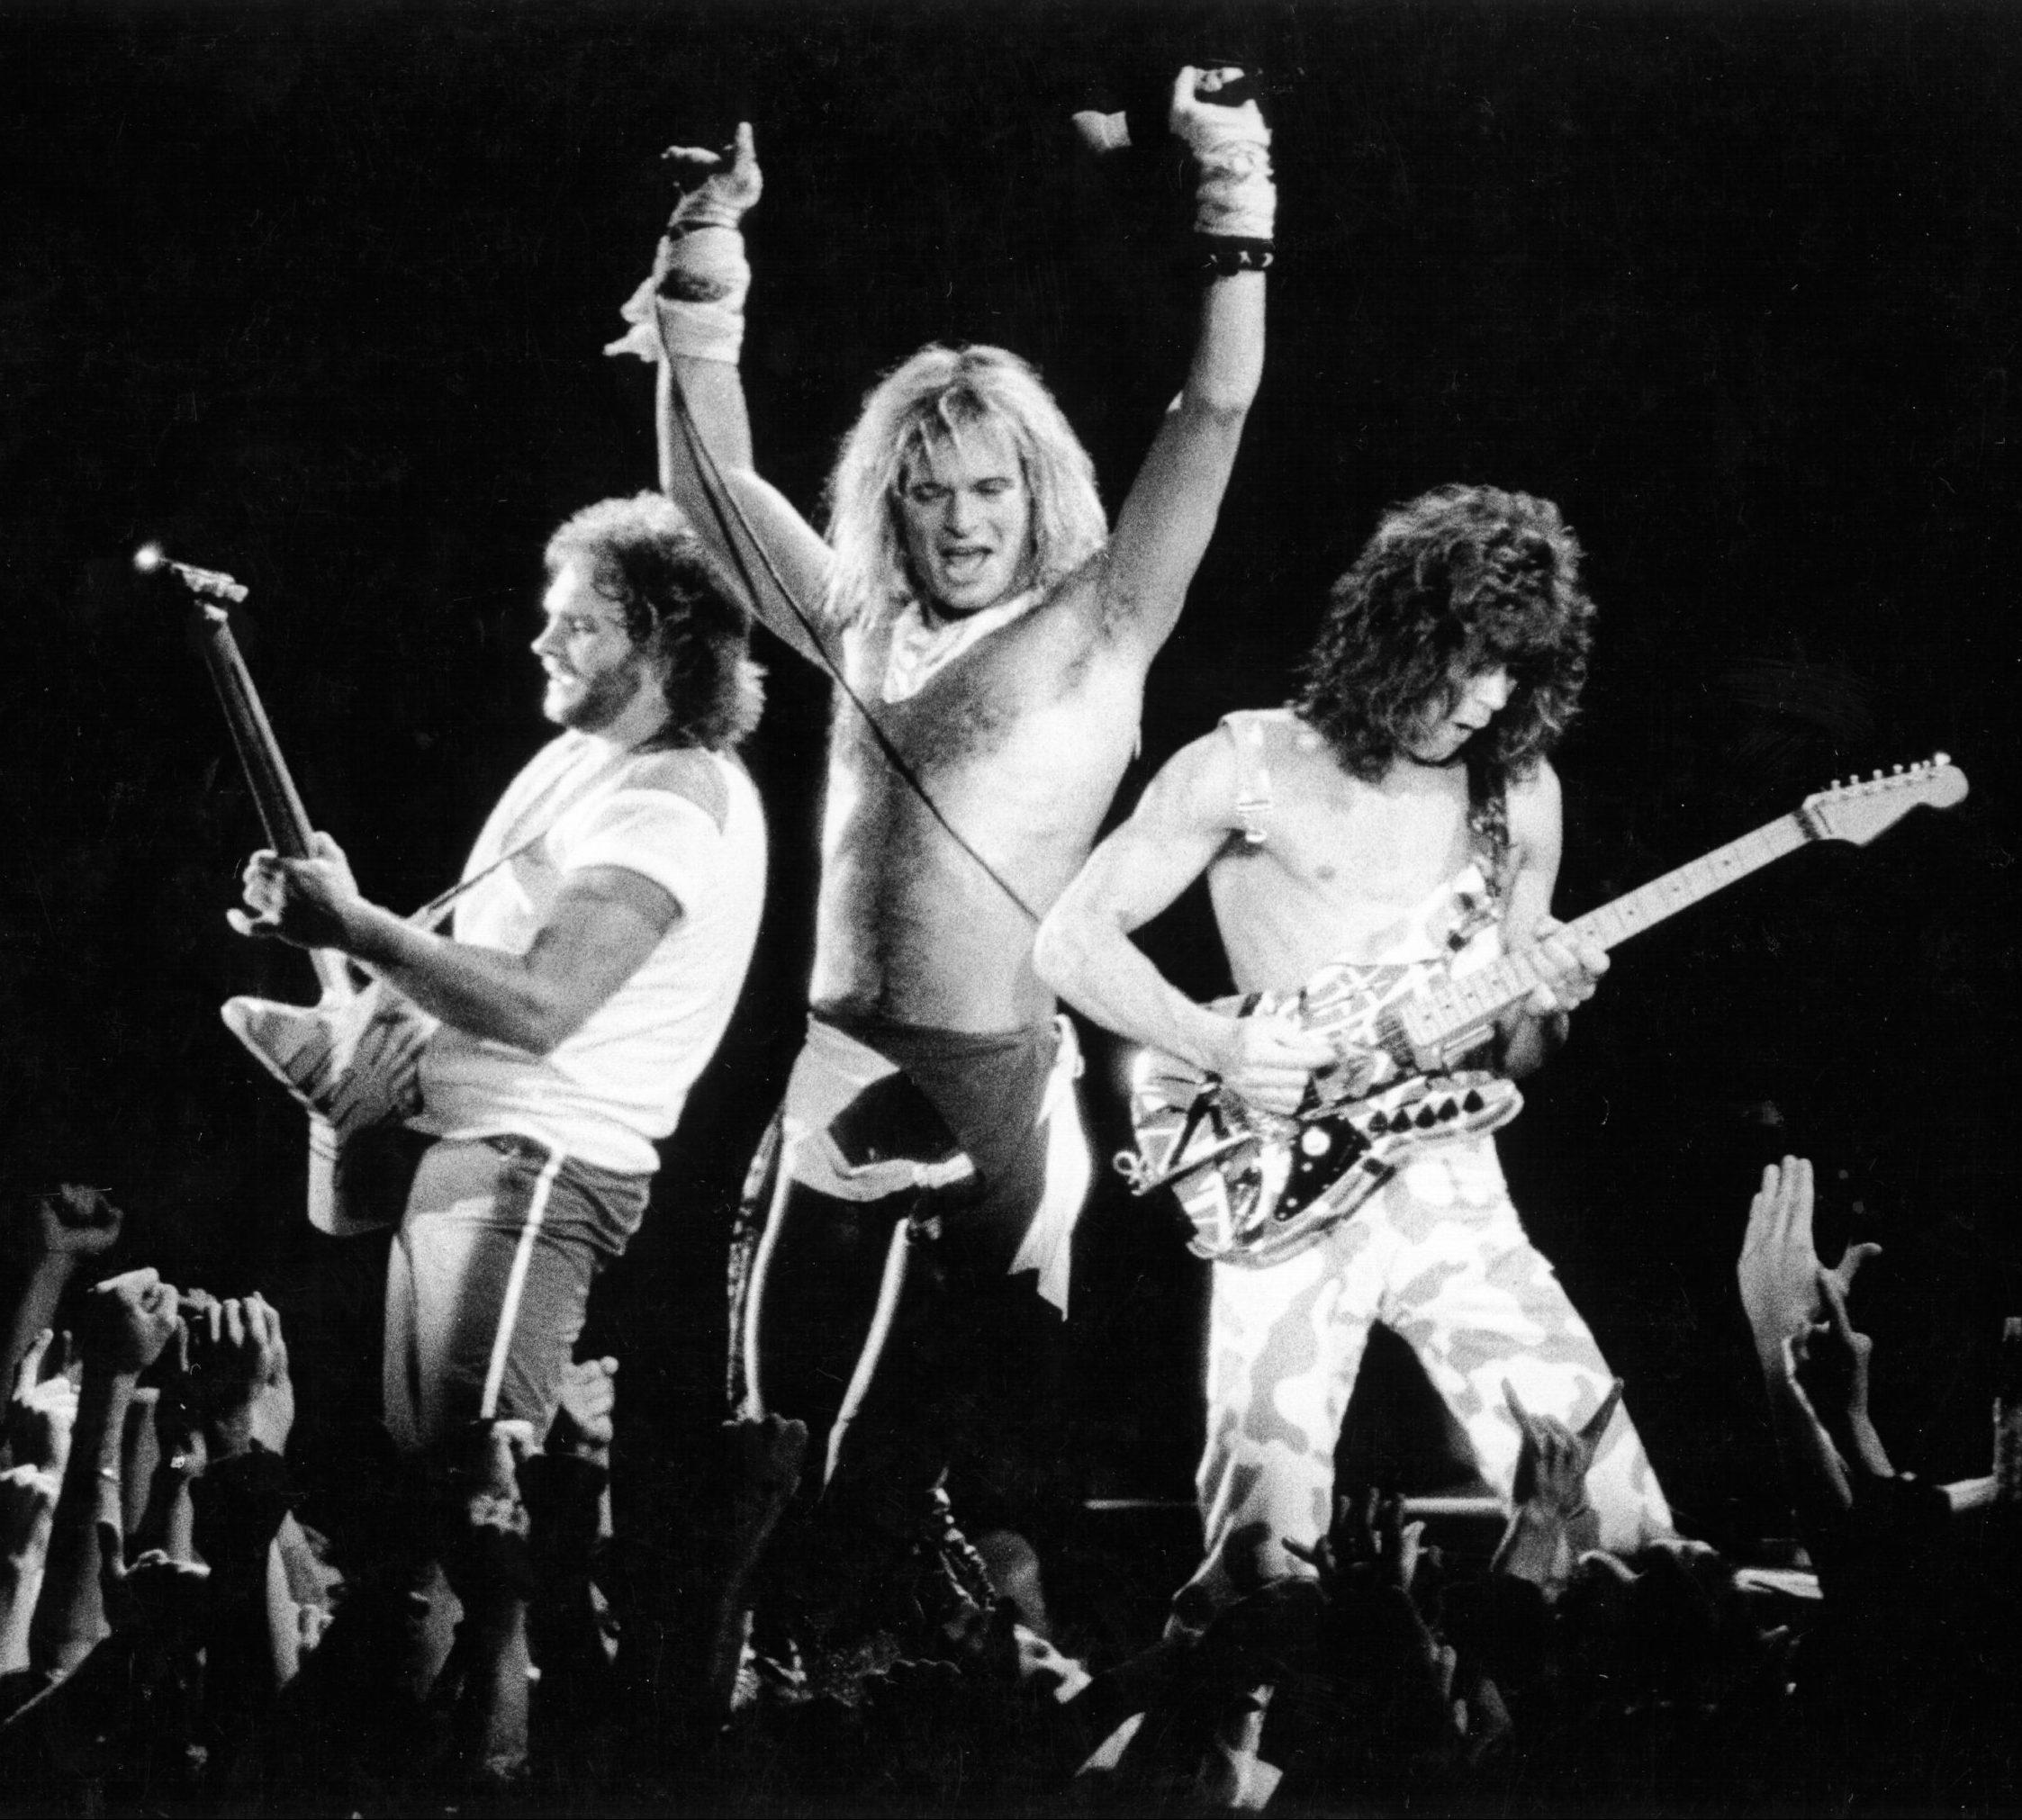 U5R775GMNYI6DEU6UUN3YQSNZI scaled e1604665275425 20 Facts About Rock Legends Van Halen That Will Make You Jump